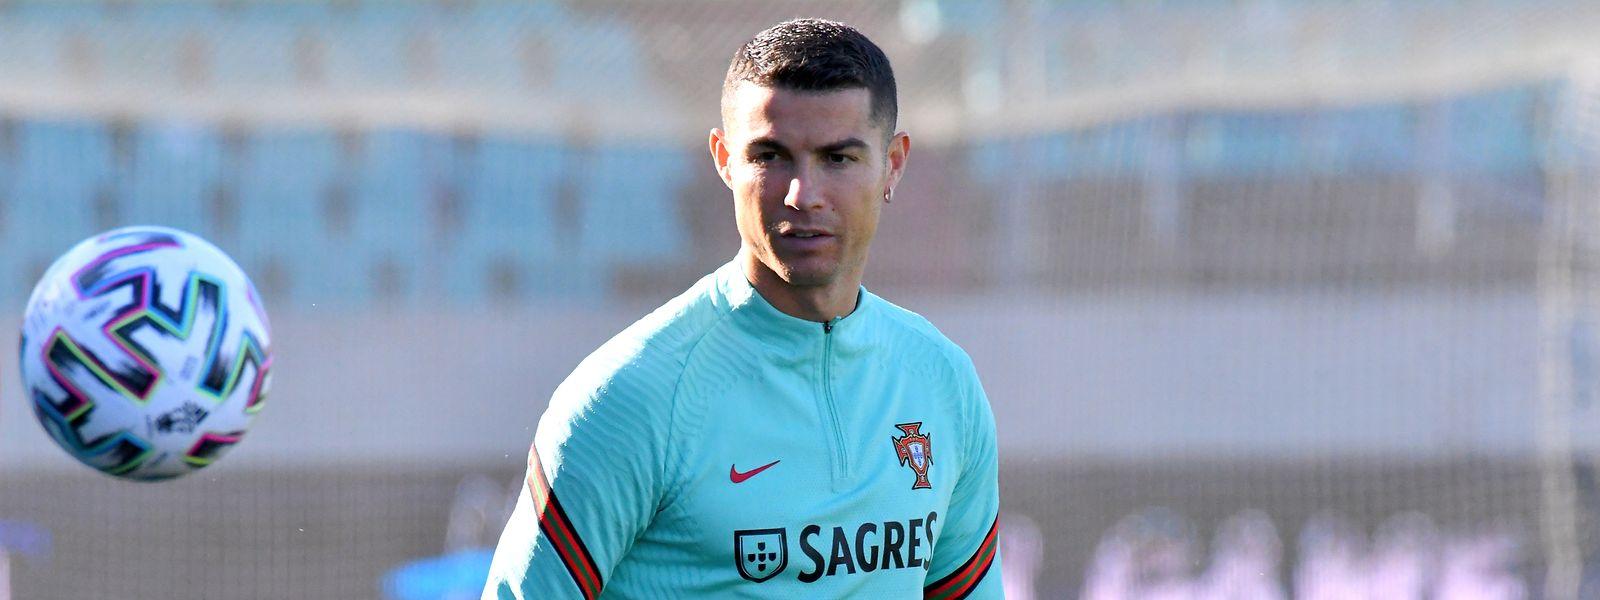 Mardi soir, la FLF affrontera Cristiano Ronaldo et son équipe au stade Josy-Barthel.